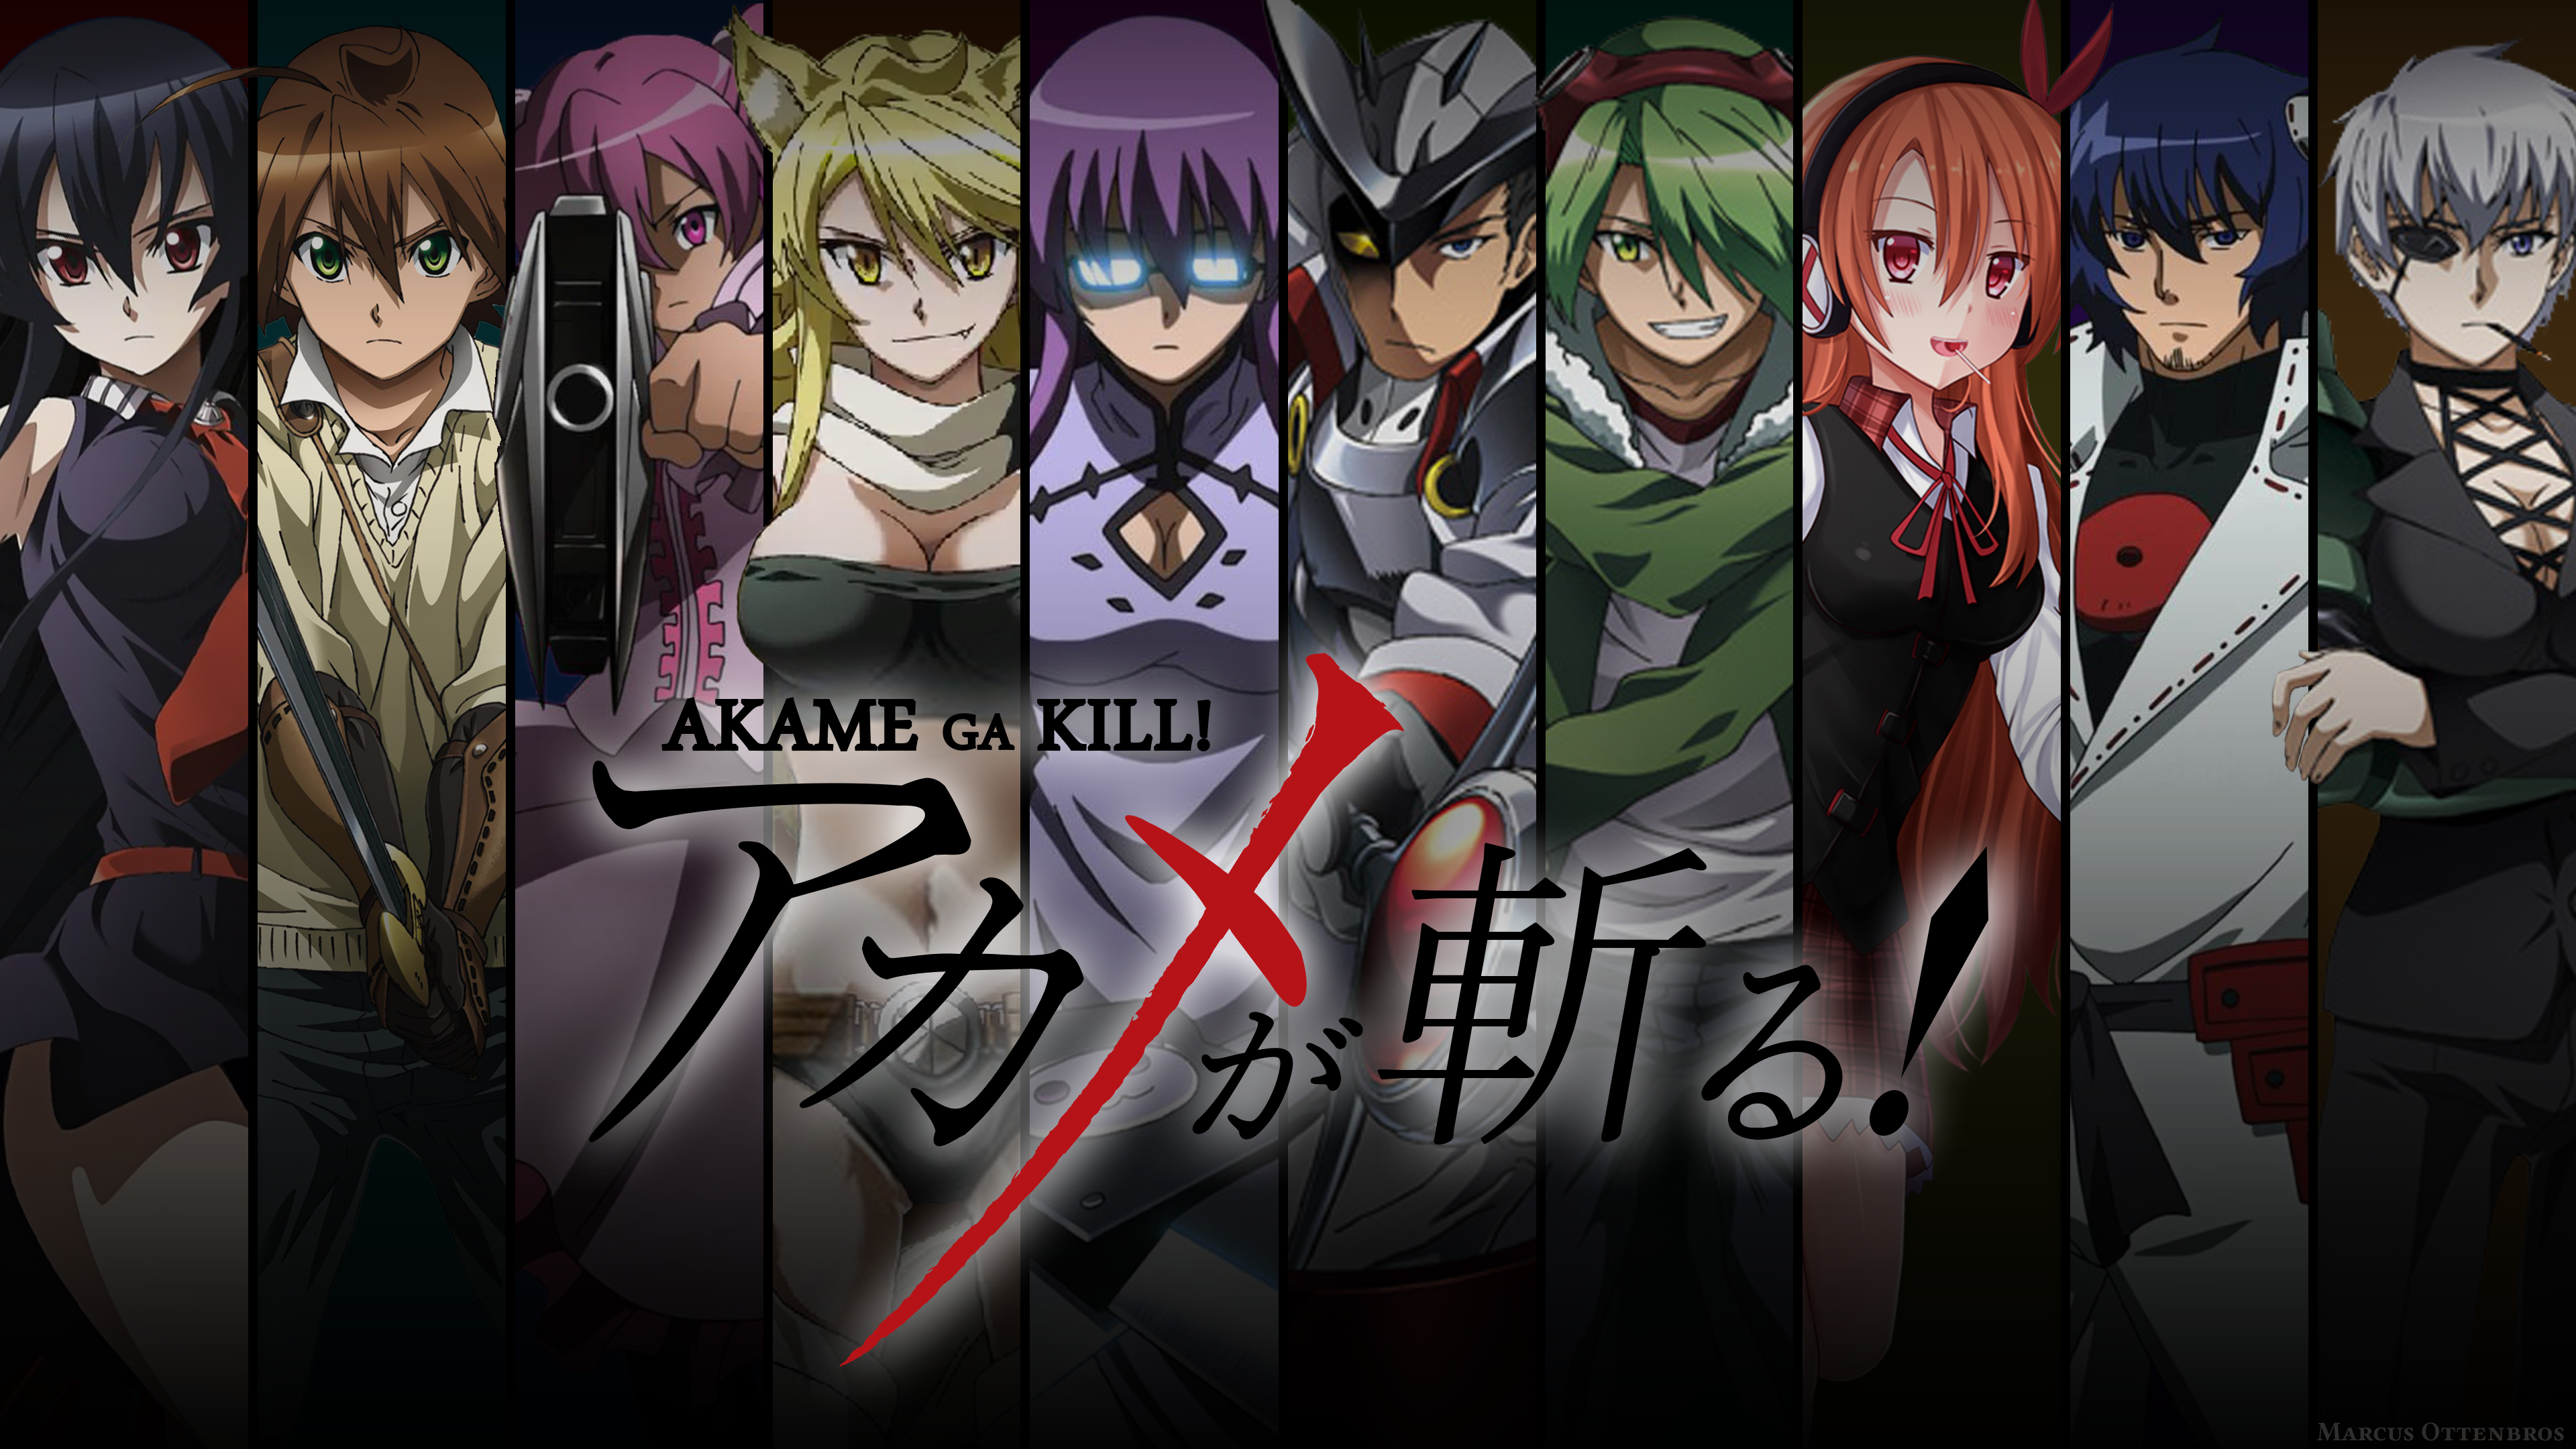 Akame ga KILL! Wallpaper Anime del Bueno! Pinterest